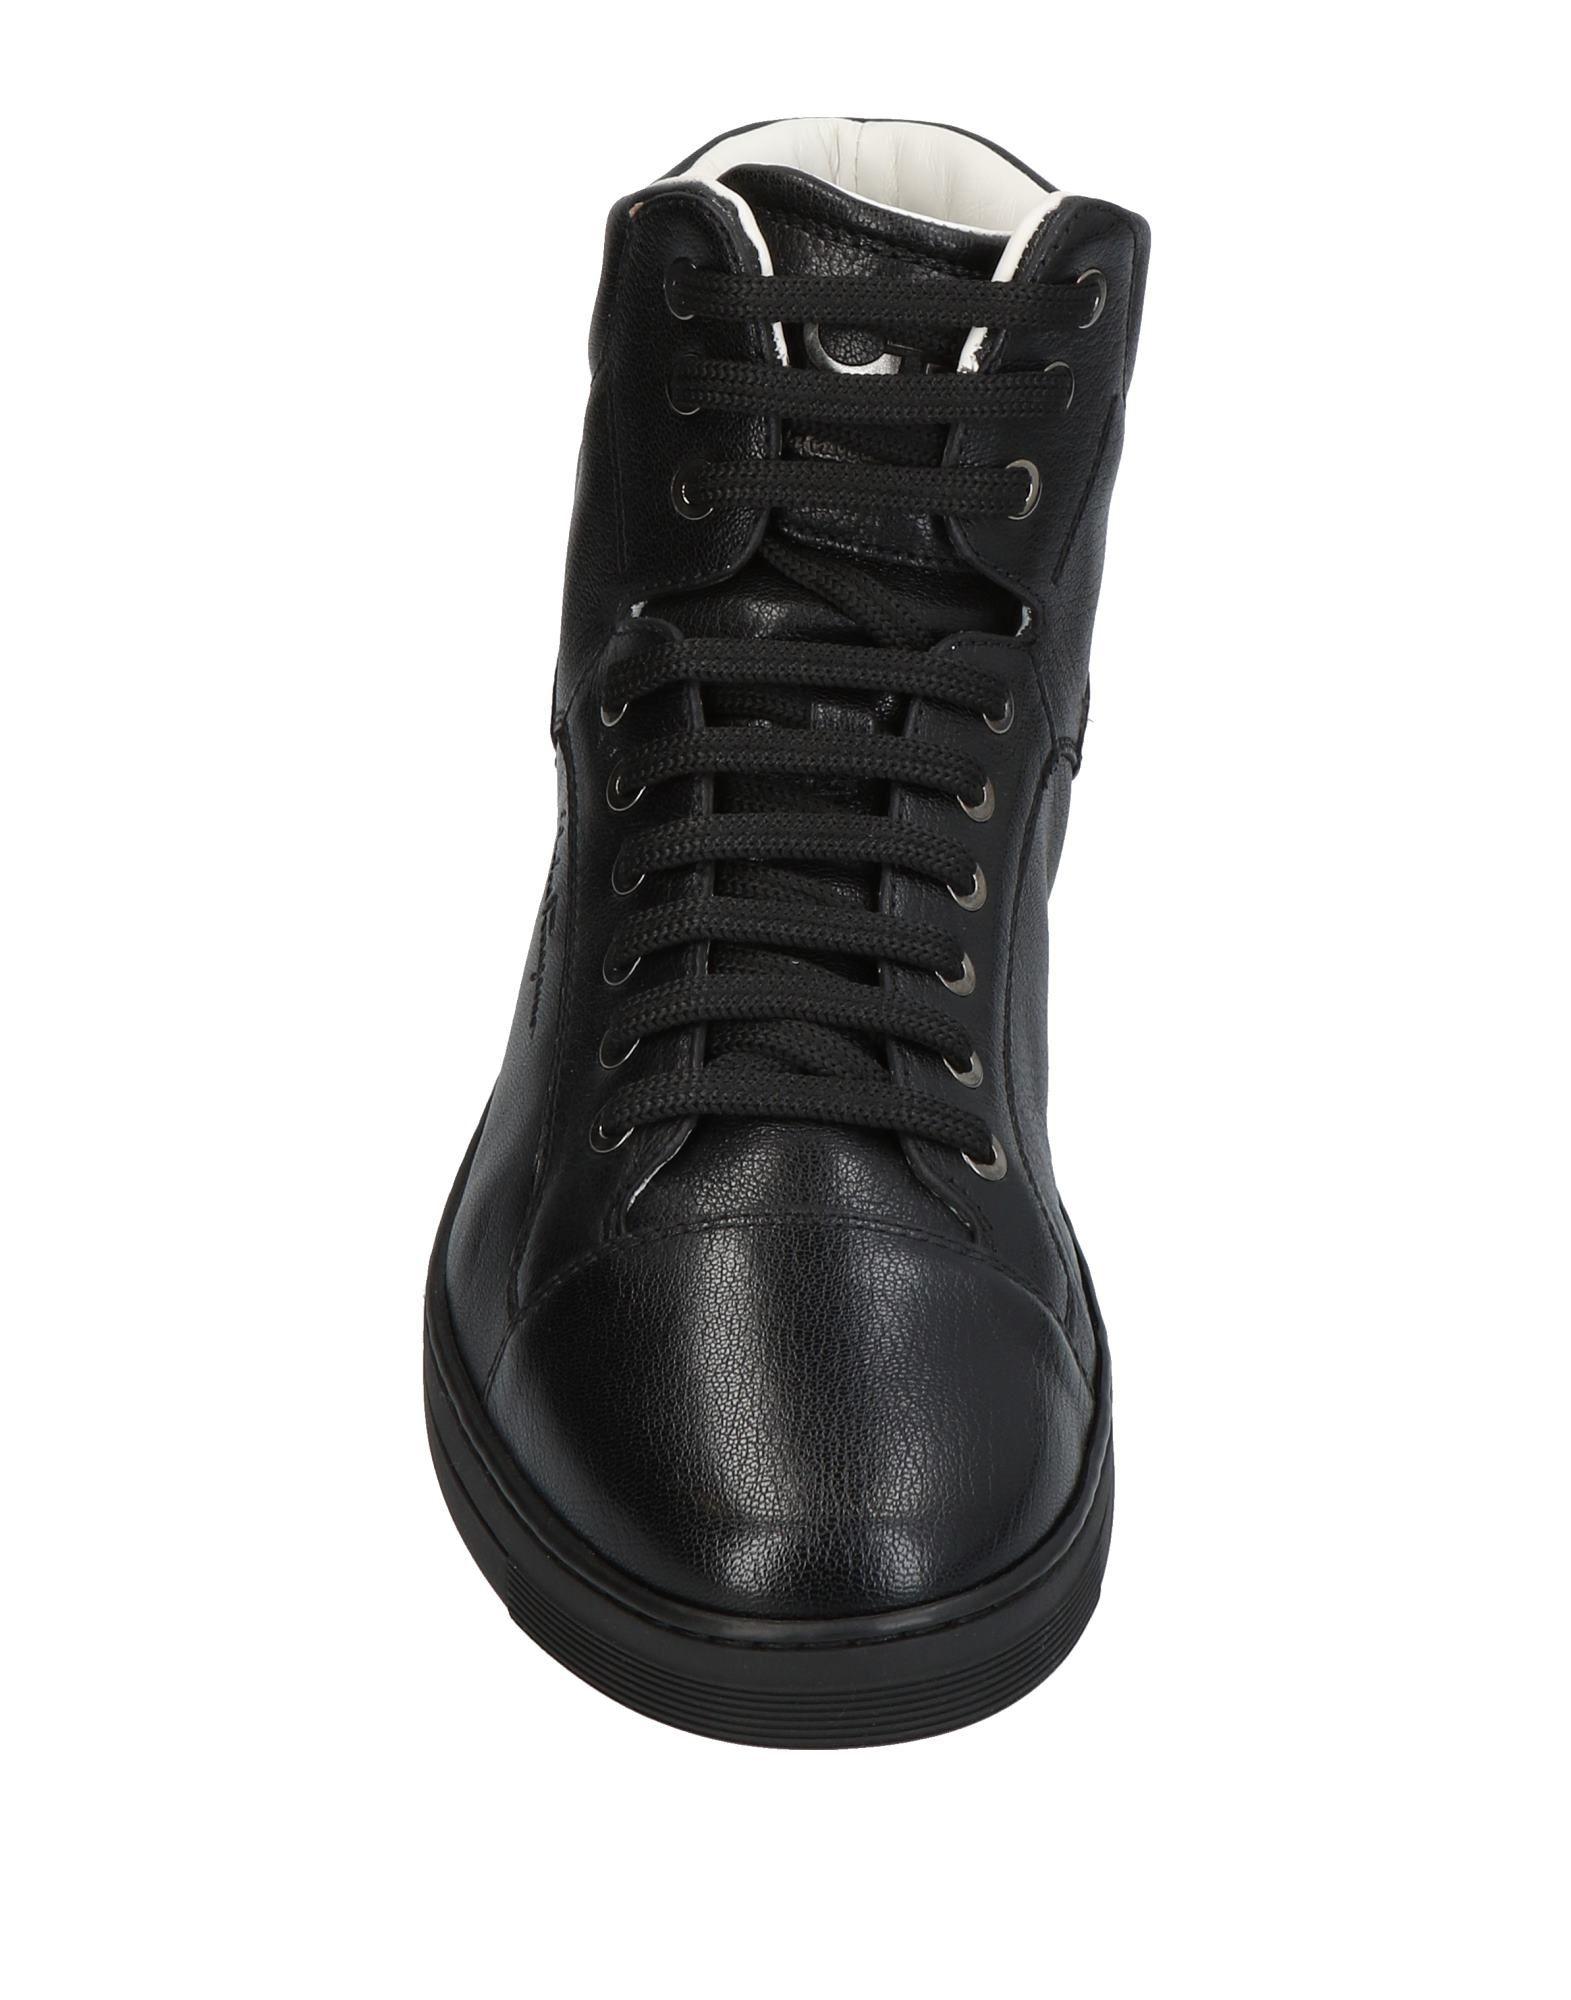 Salvatore Ferragamo Sneakers Qualität Herren  11434862TE Gute Qualität Sneakers beliebte Schuhe a9191e